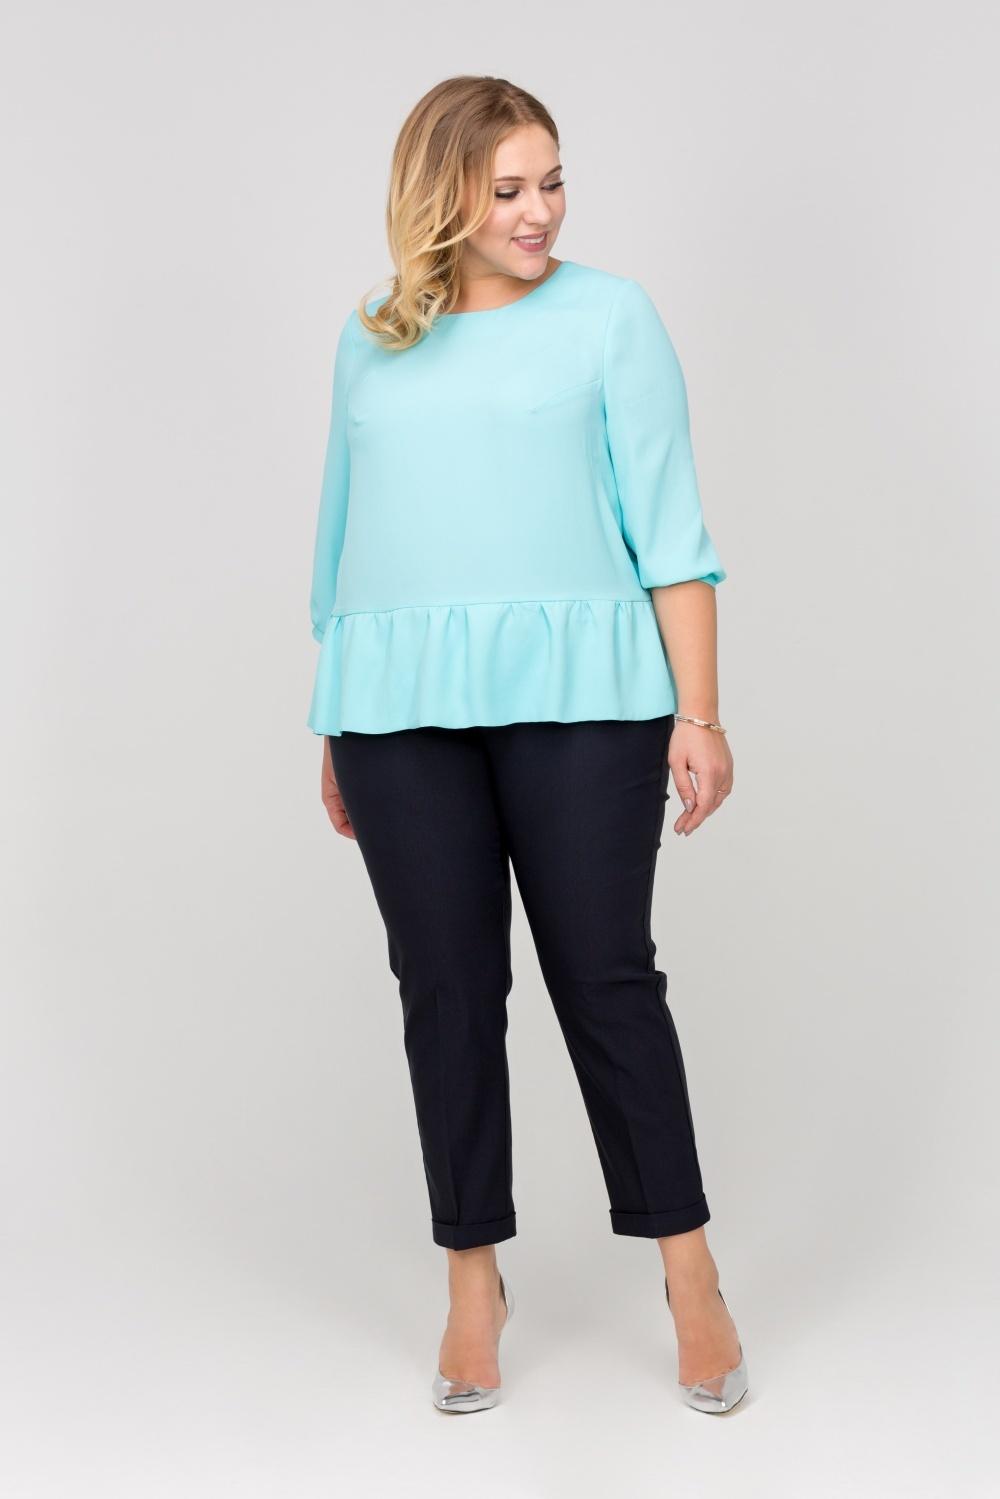 Блузки Блузка Марсала голубая be33074ed74c18ab93c83bd820911b46.jpg